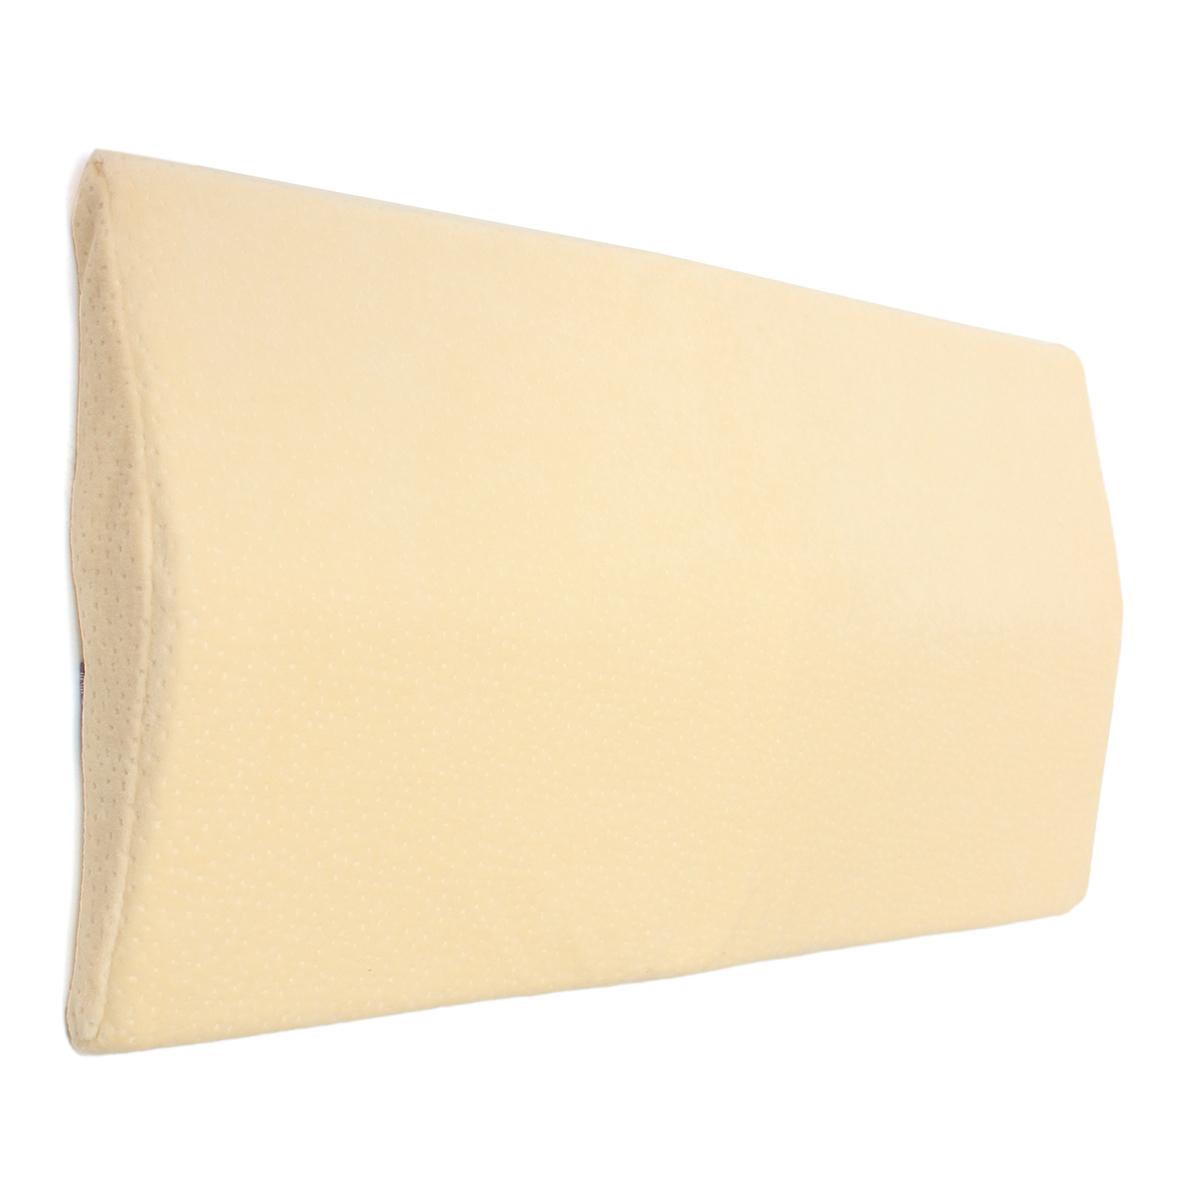 Memory Foam Back Lumbar Support Sleeping Cushion Pain